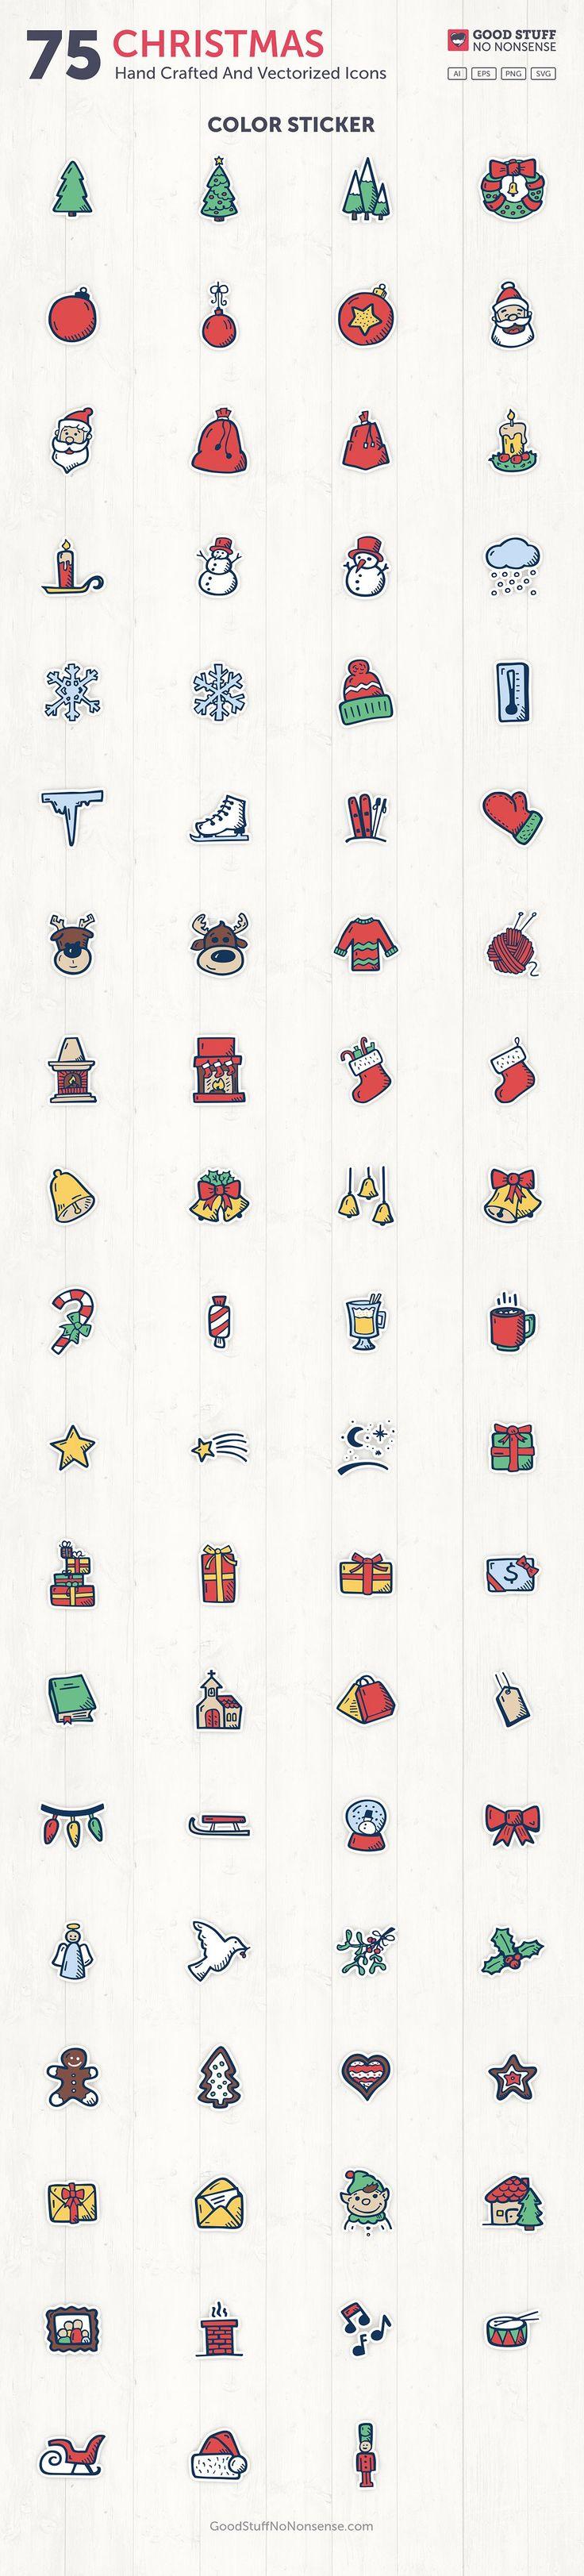 Christmas Hand Drawn Icons Basic icon, flaticon, icons